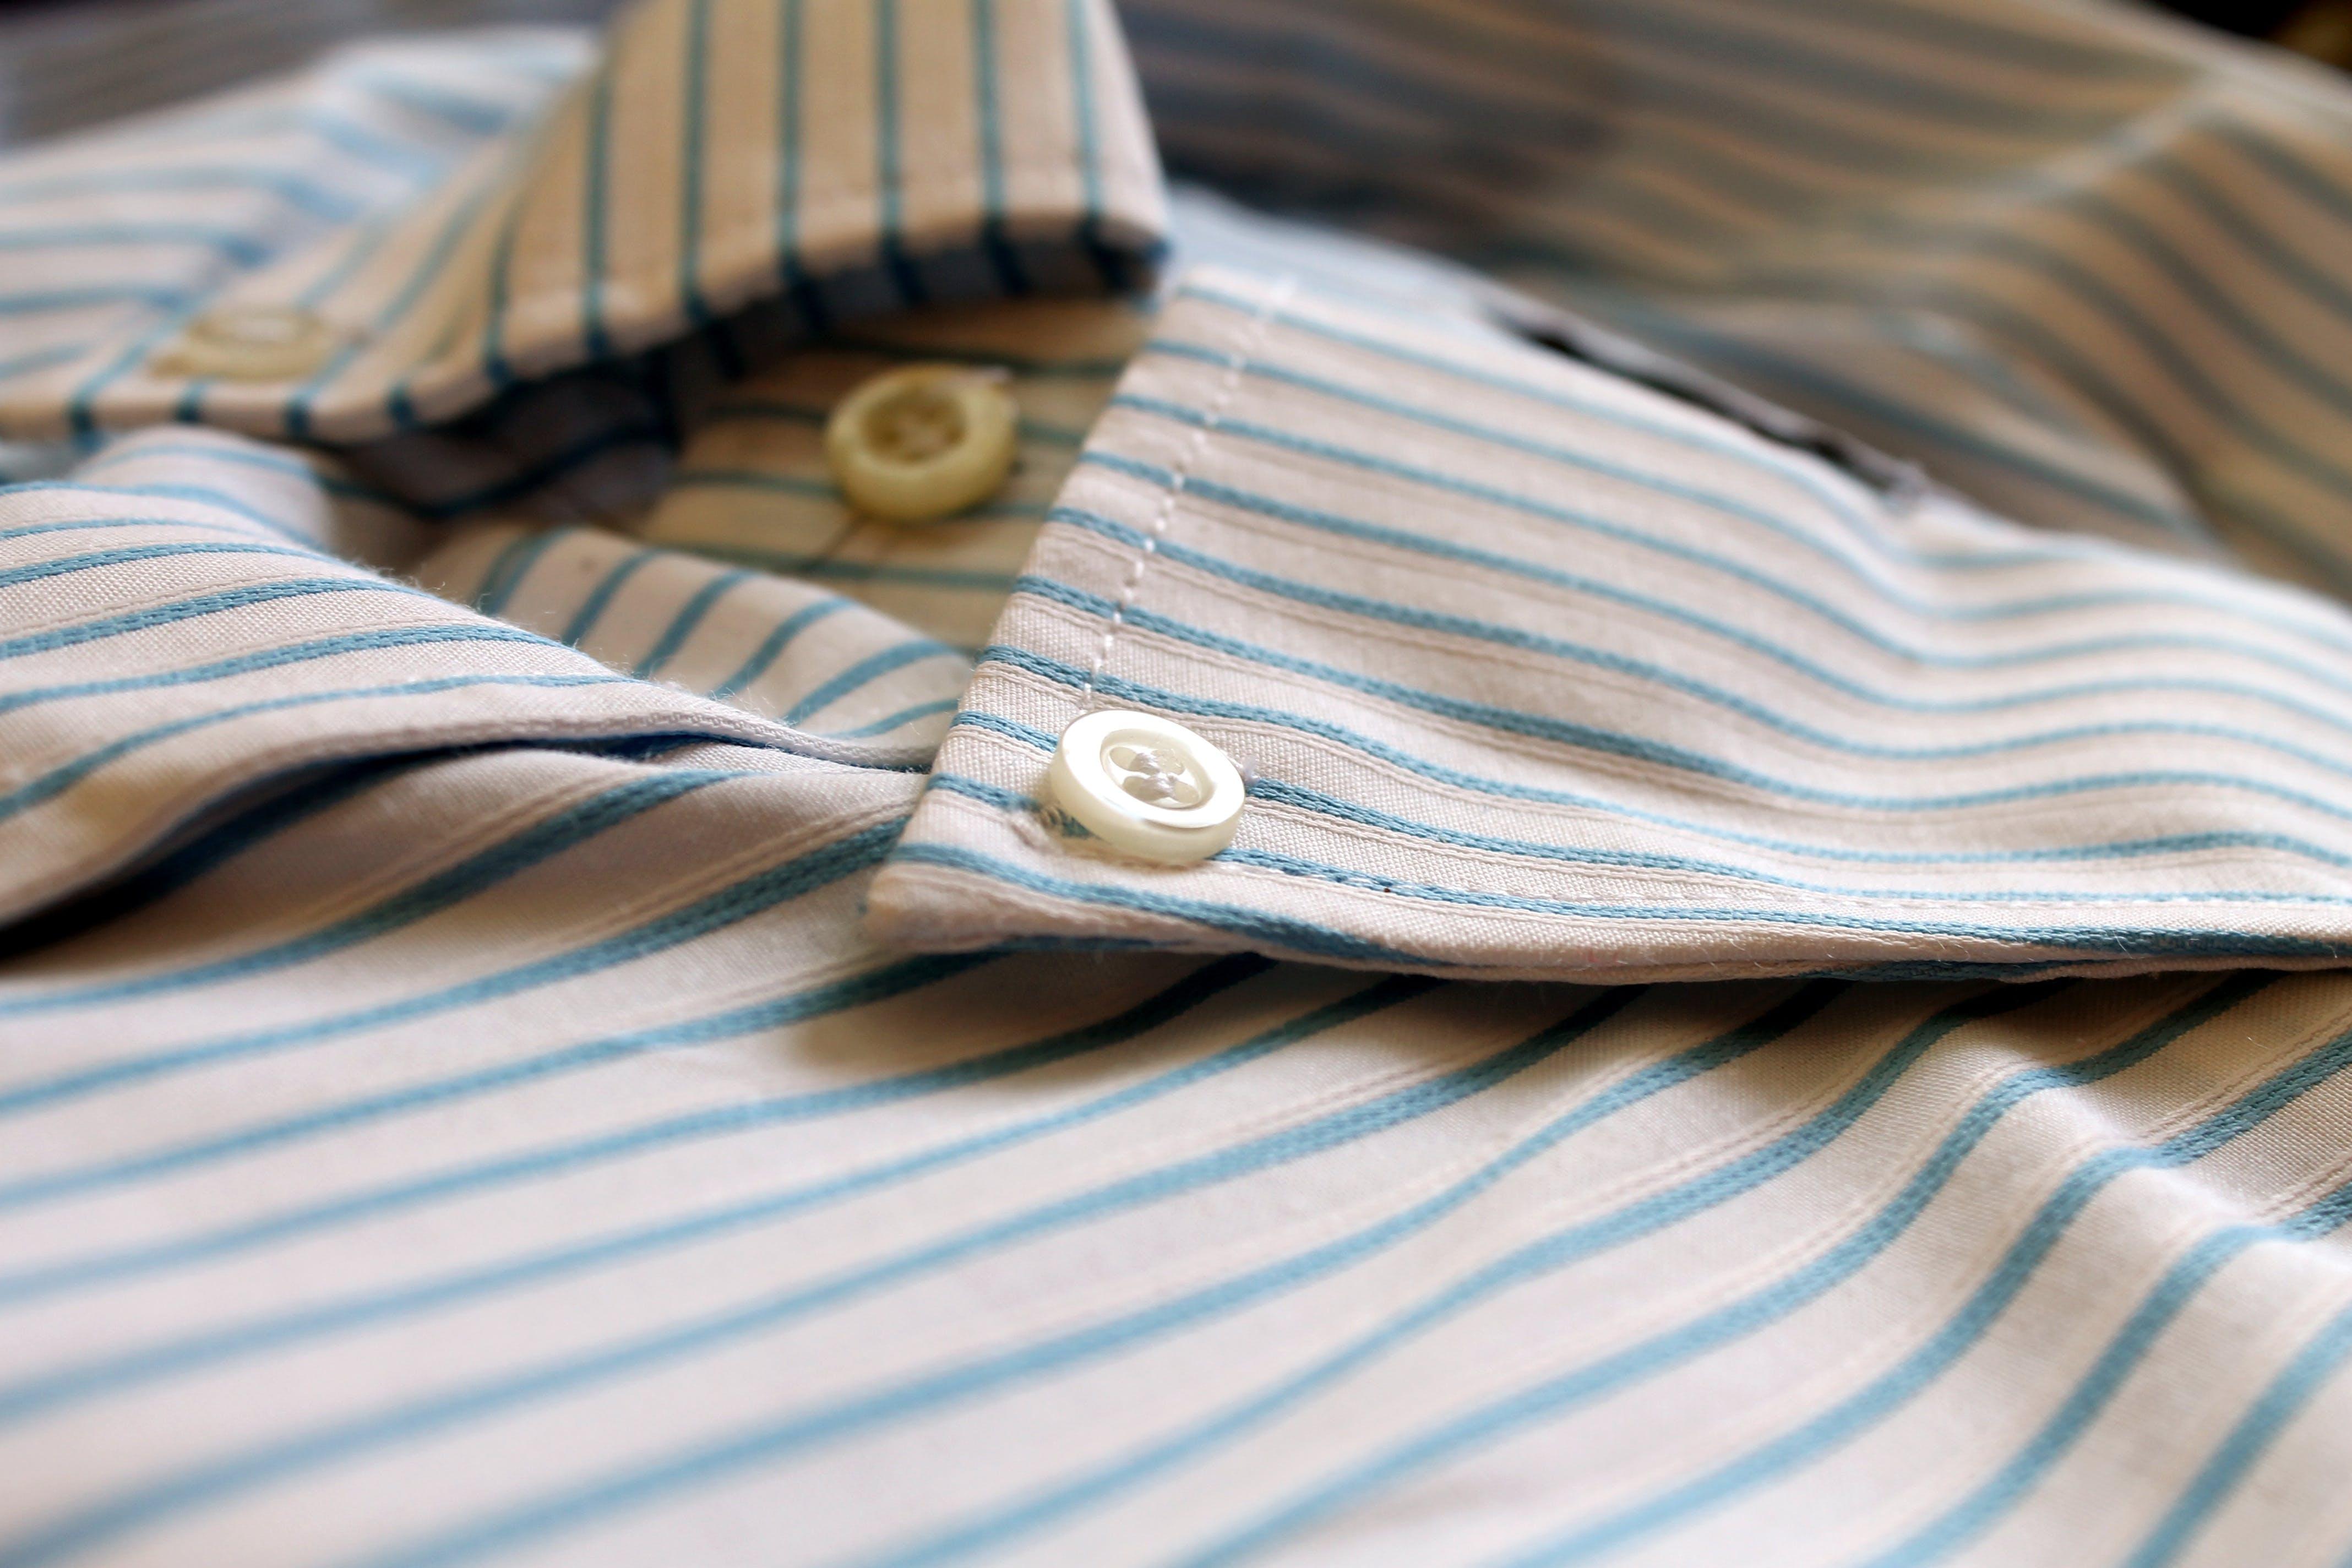 Free stock photo of clothing, cotton shirts, men's clothing, men's shirts